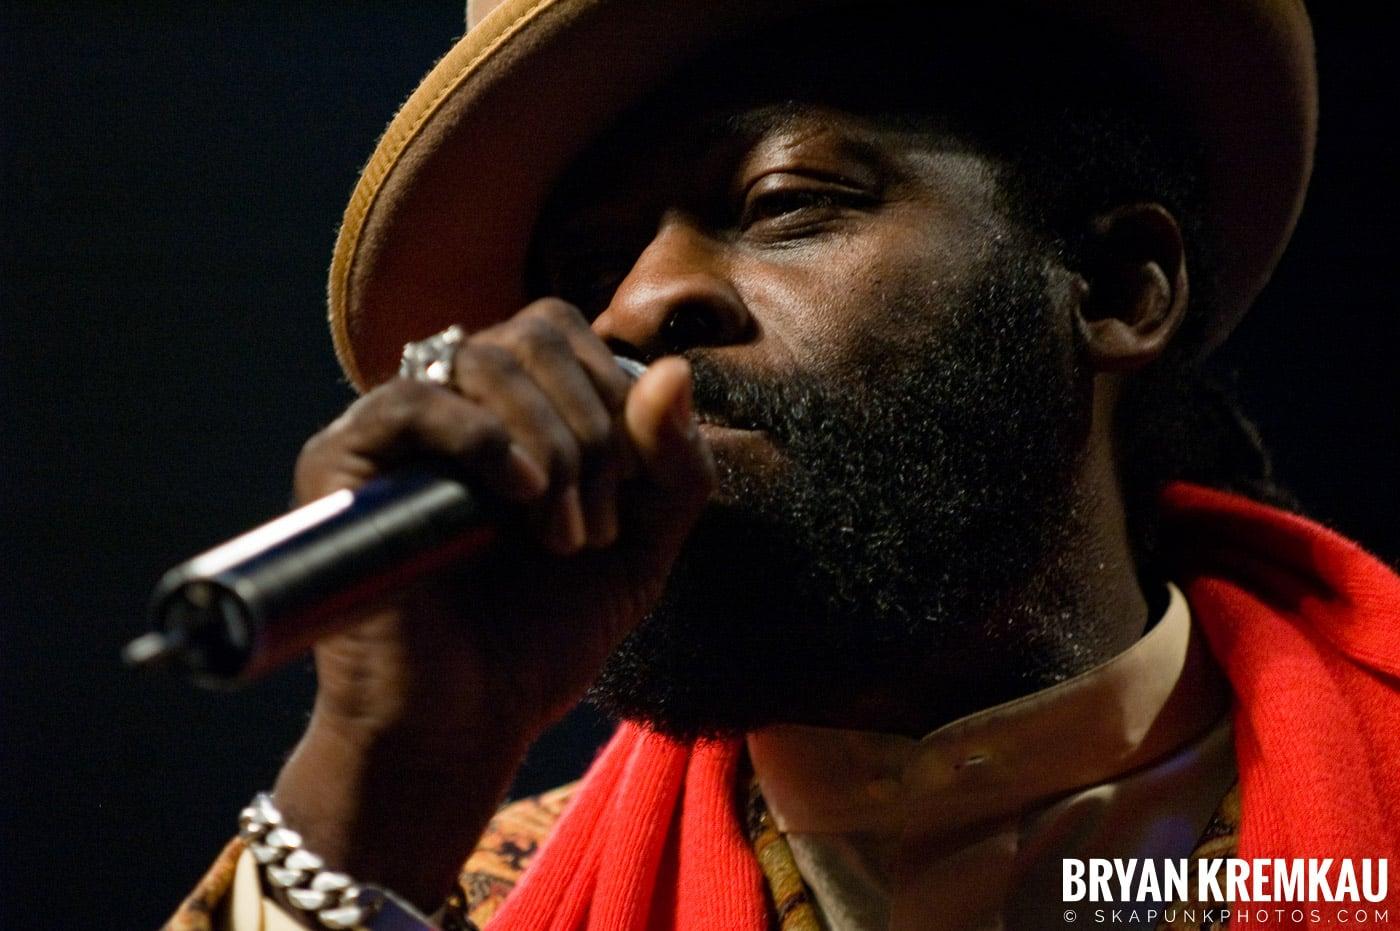 Jimmy Riley @ Vintage Reggae Fest - Hammerstein Ballroom, NYC - 12.16.07 (10)